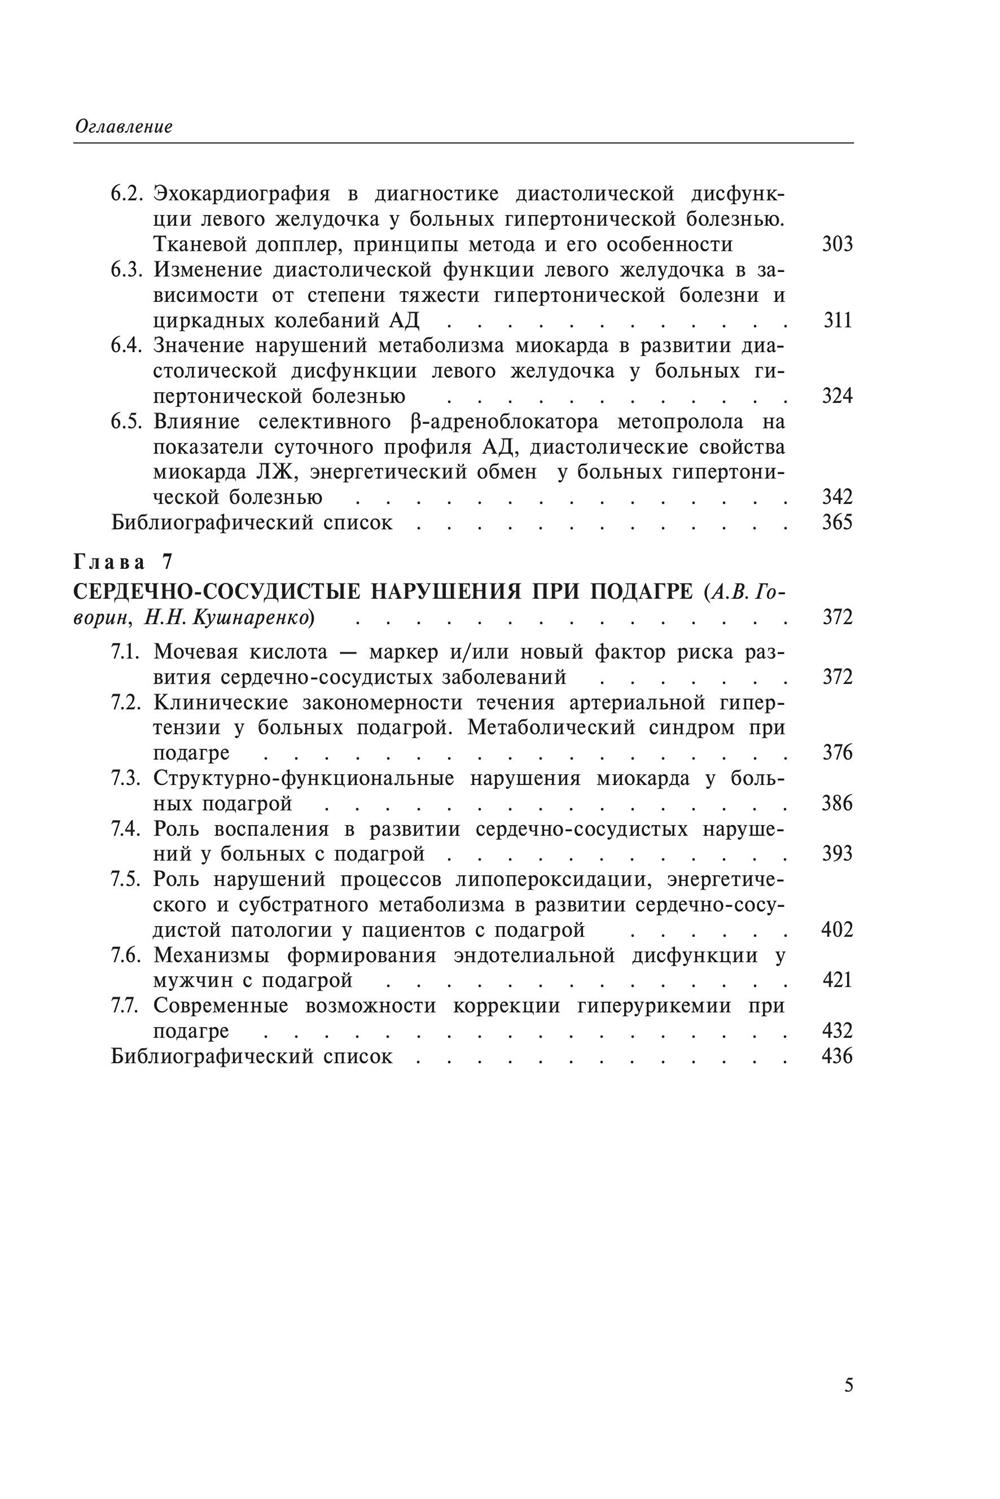 http://ipic.su/img/img7/fs/03.1591686036.jpg